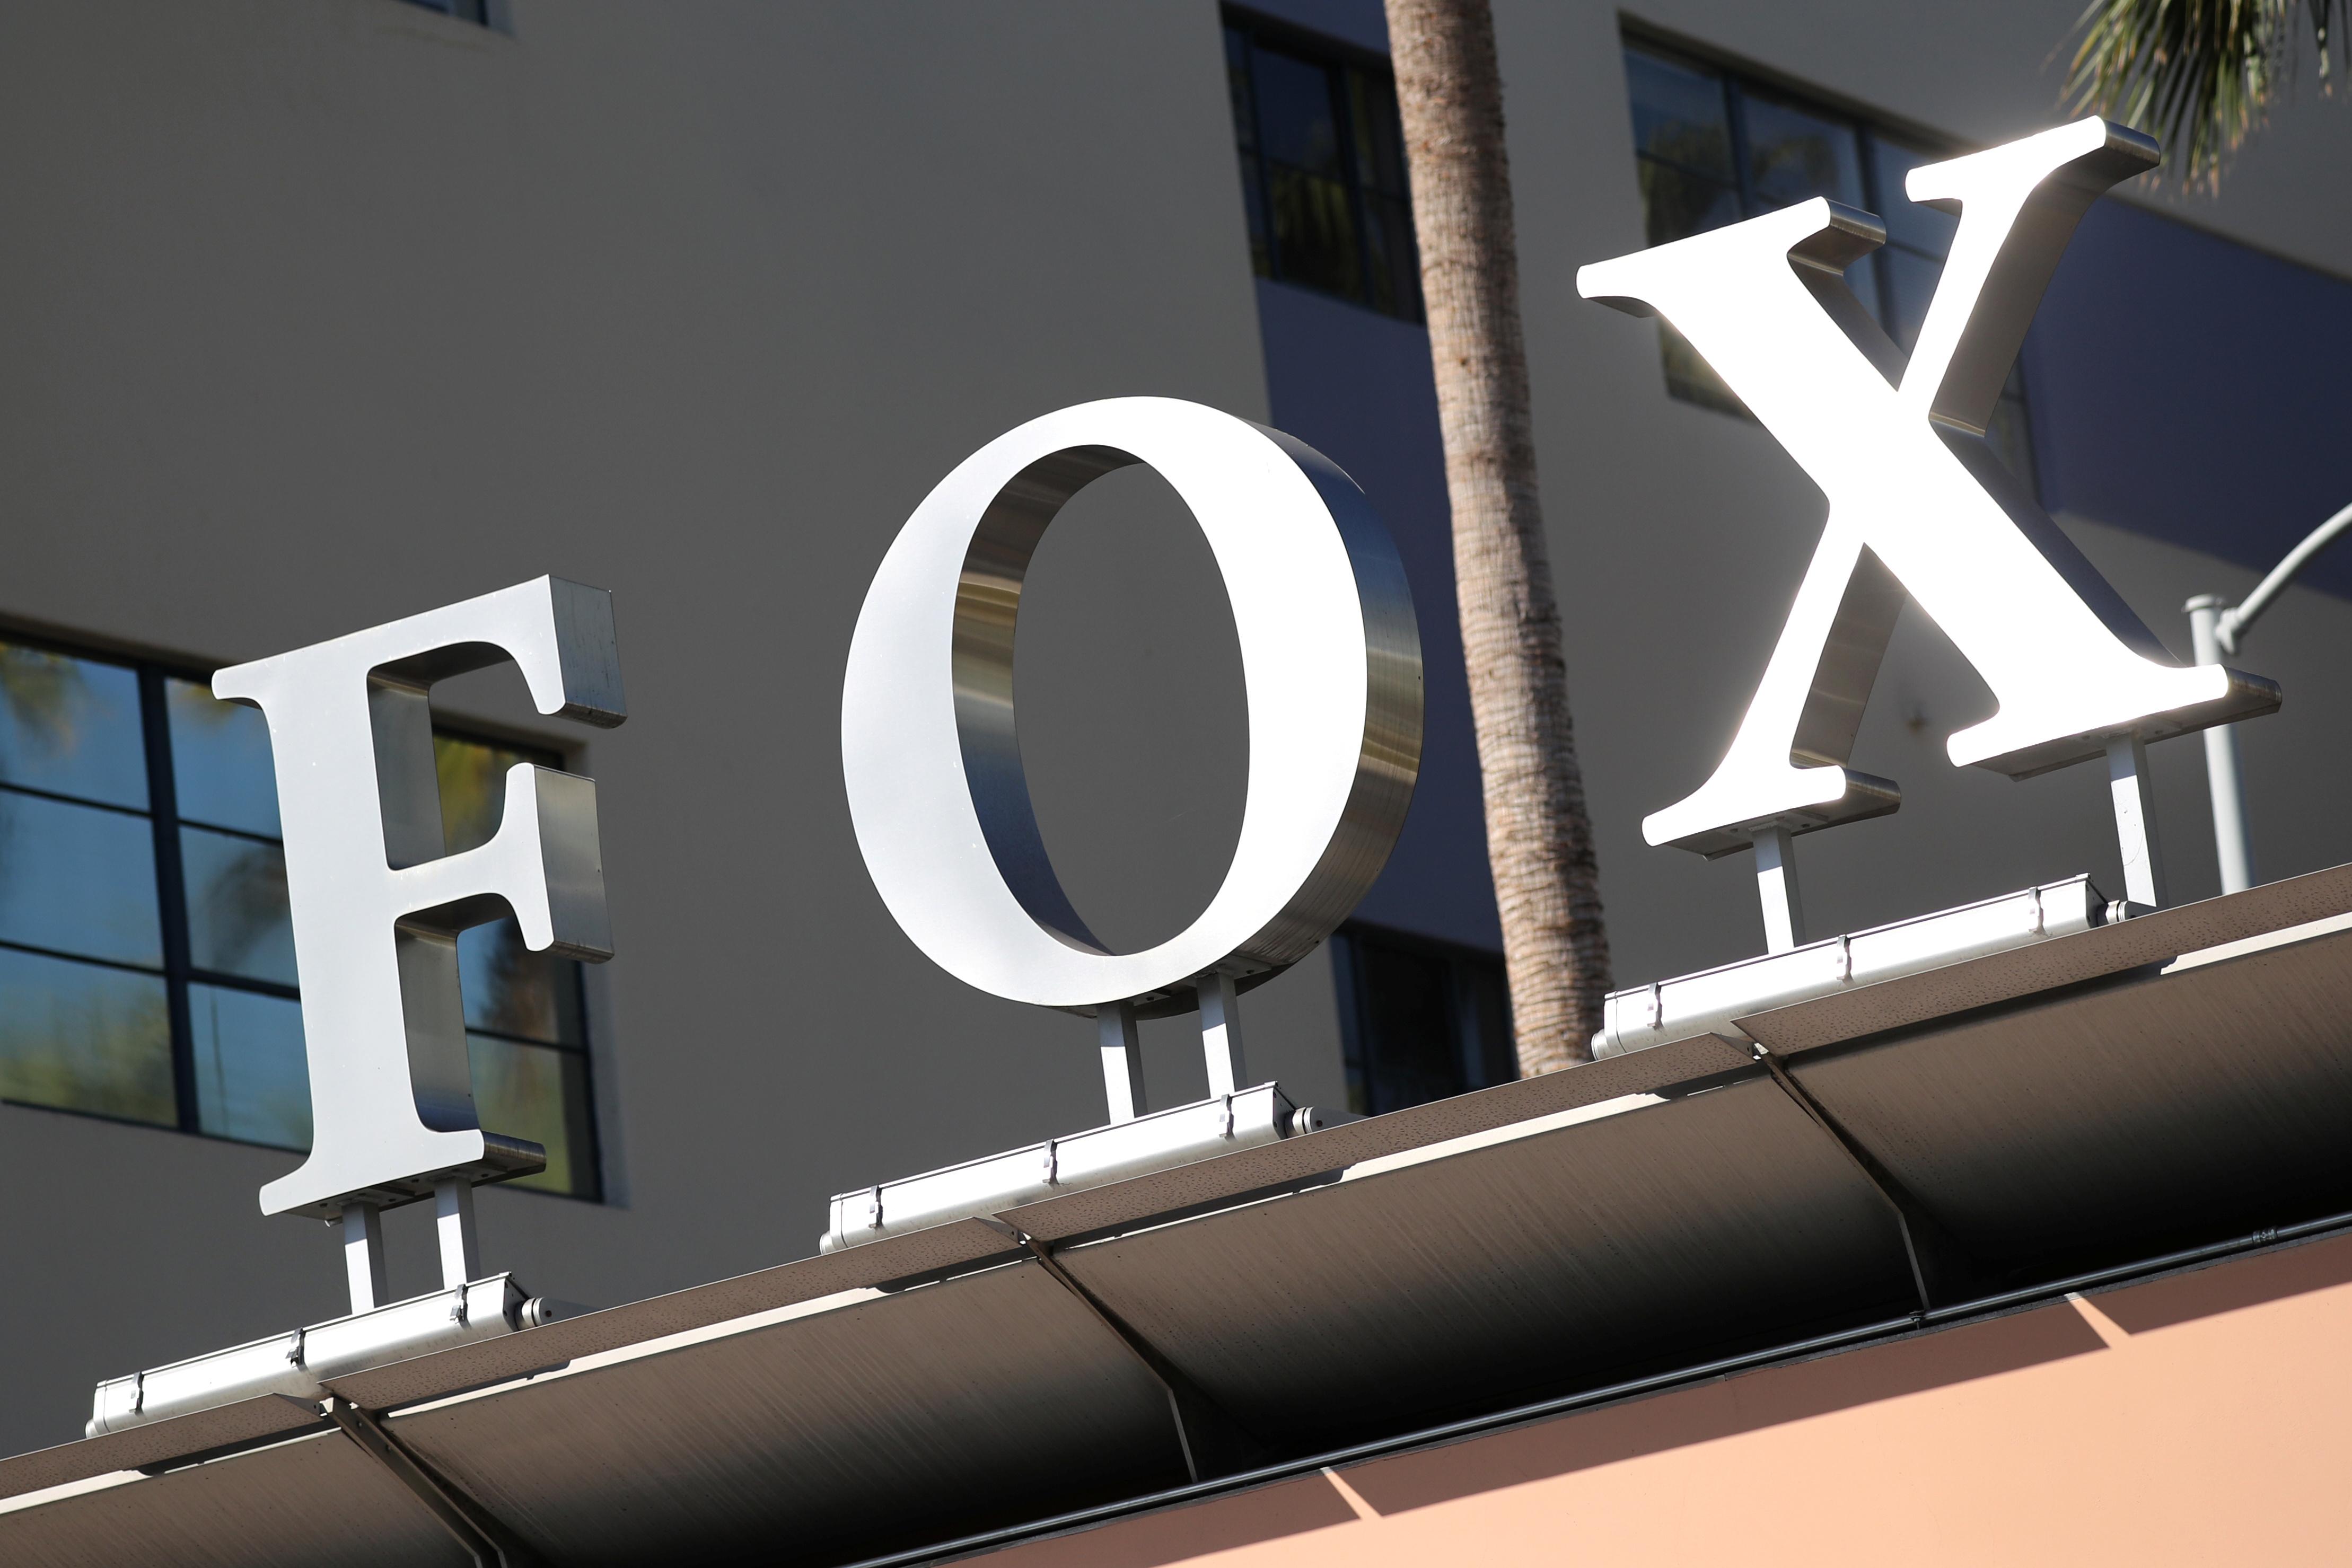 The Twenty-First Century Fox Studios logo is seen in Los Angeles, California U.S. November 6, 2017. REUTERS/Lucy Nicholson